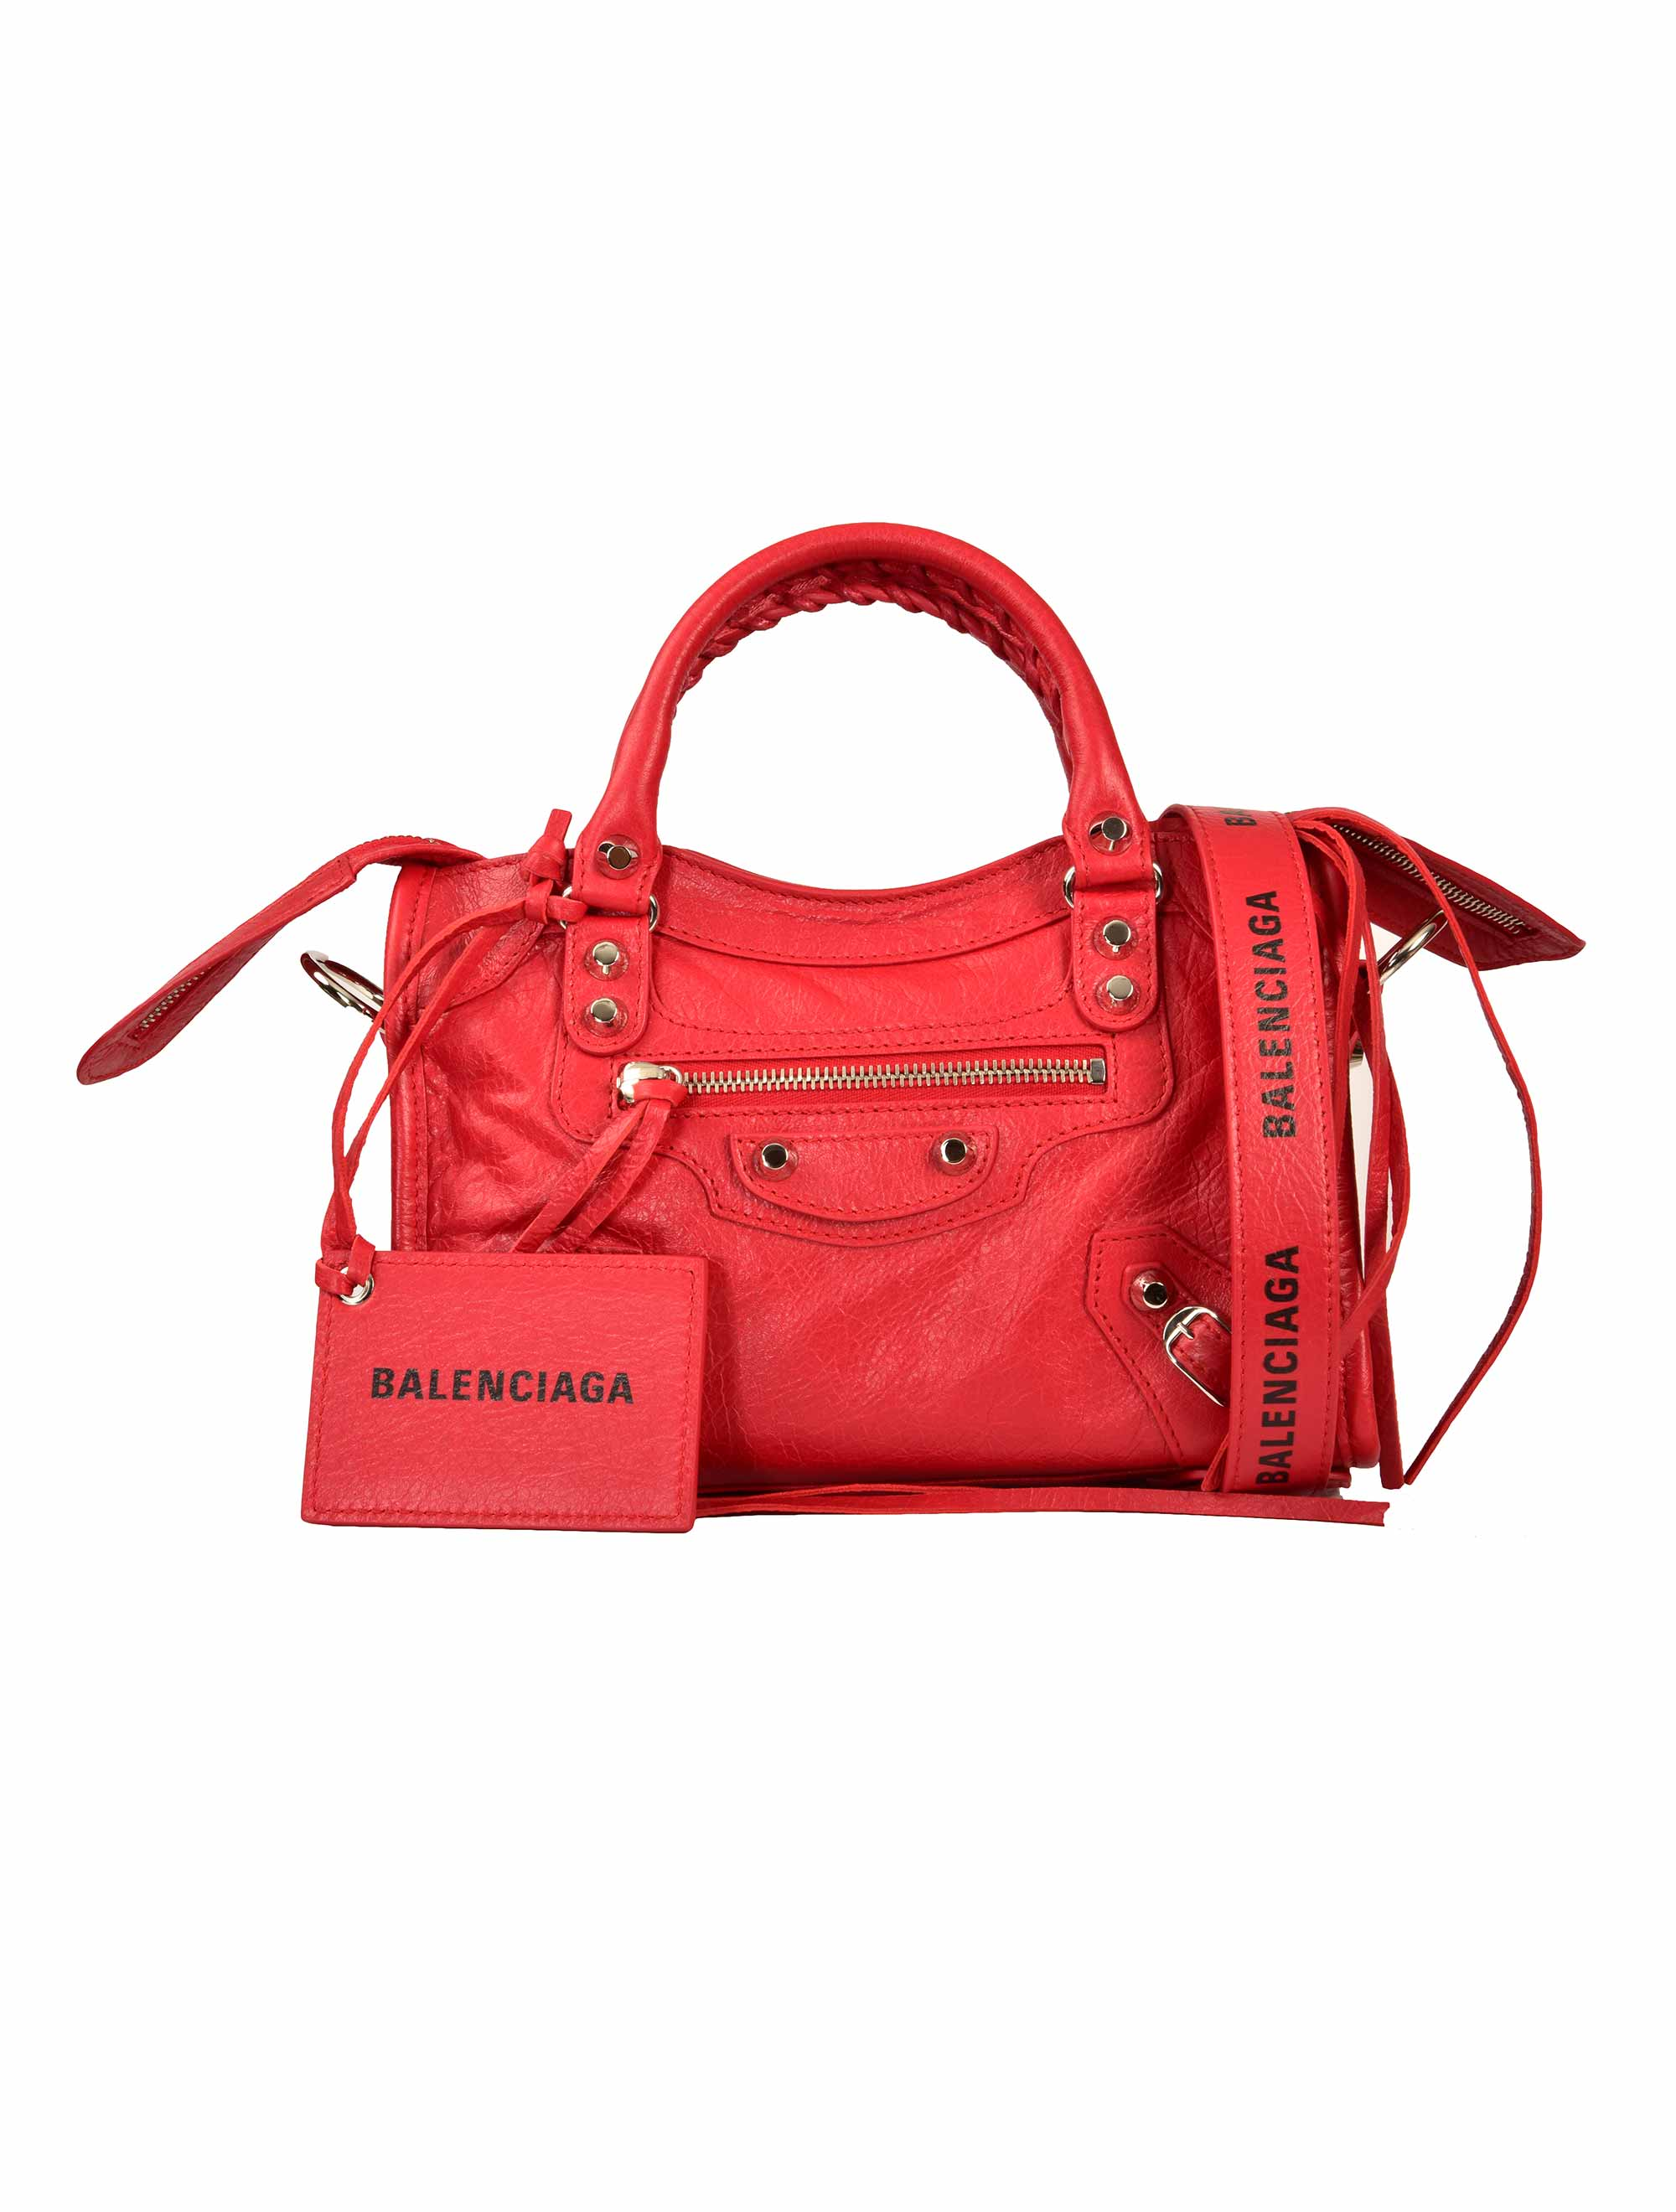 65bbb9e8ac9370 Mimma Ninni – Luxury and Fashion Shopping. Balenciaga Classic Mini ...